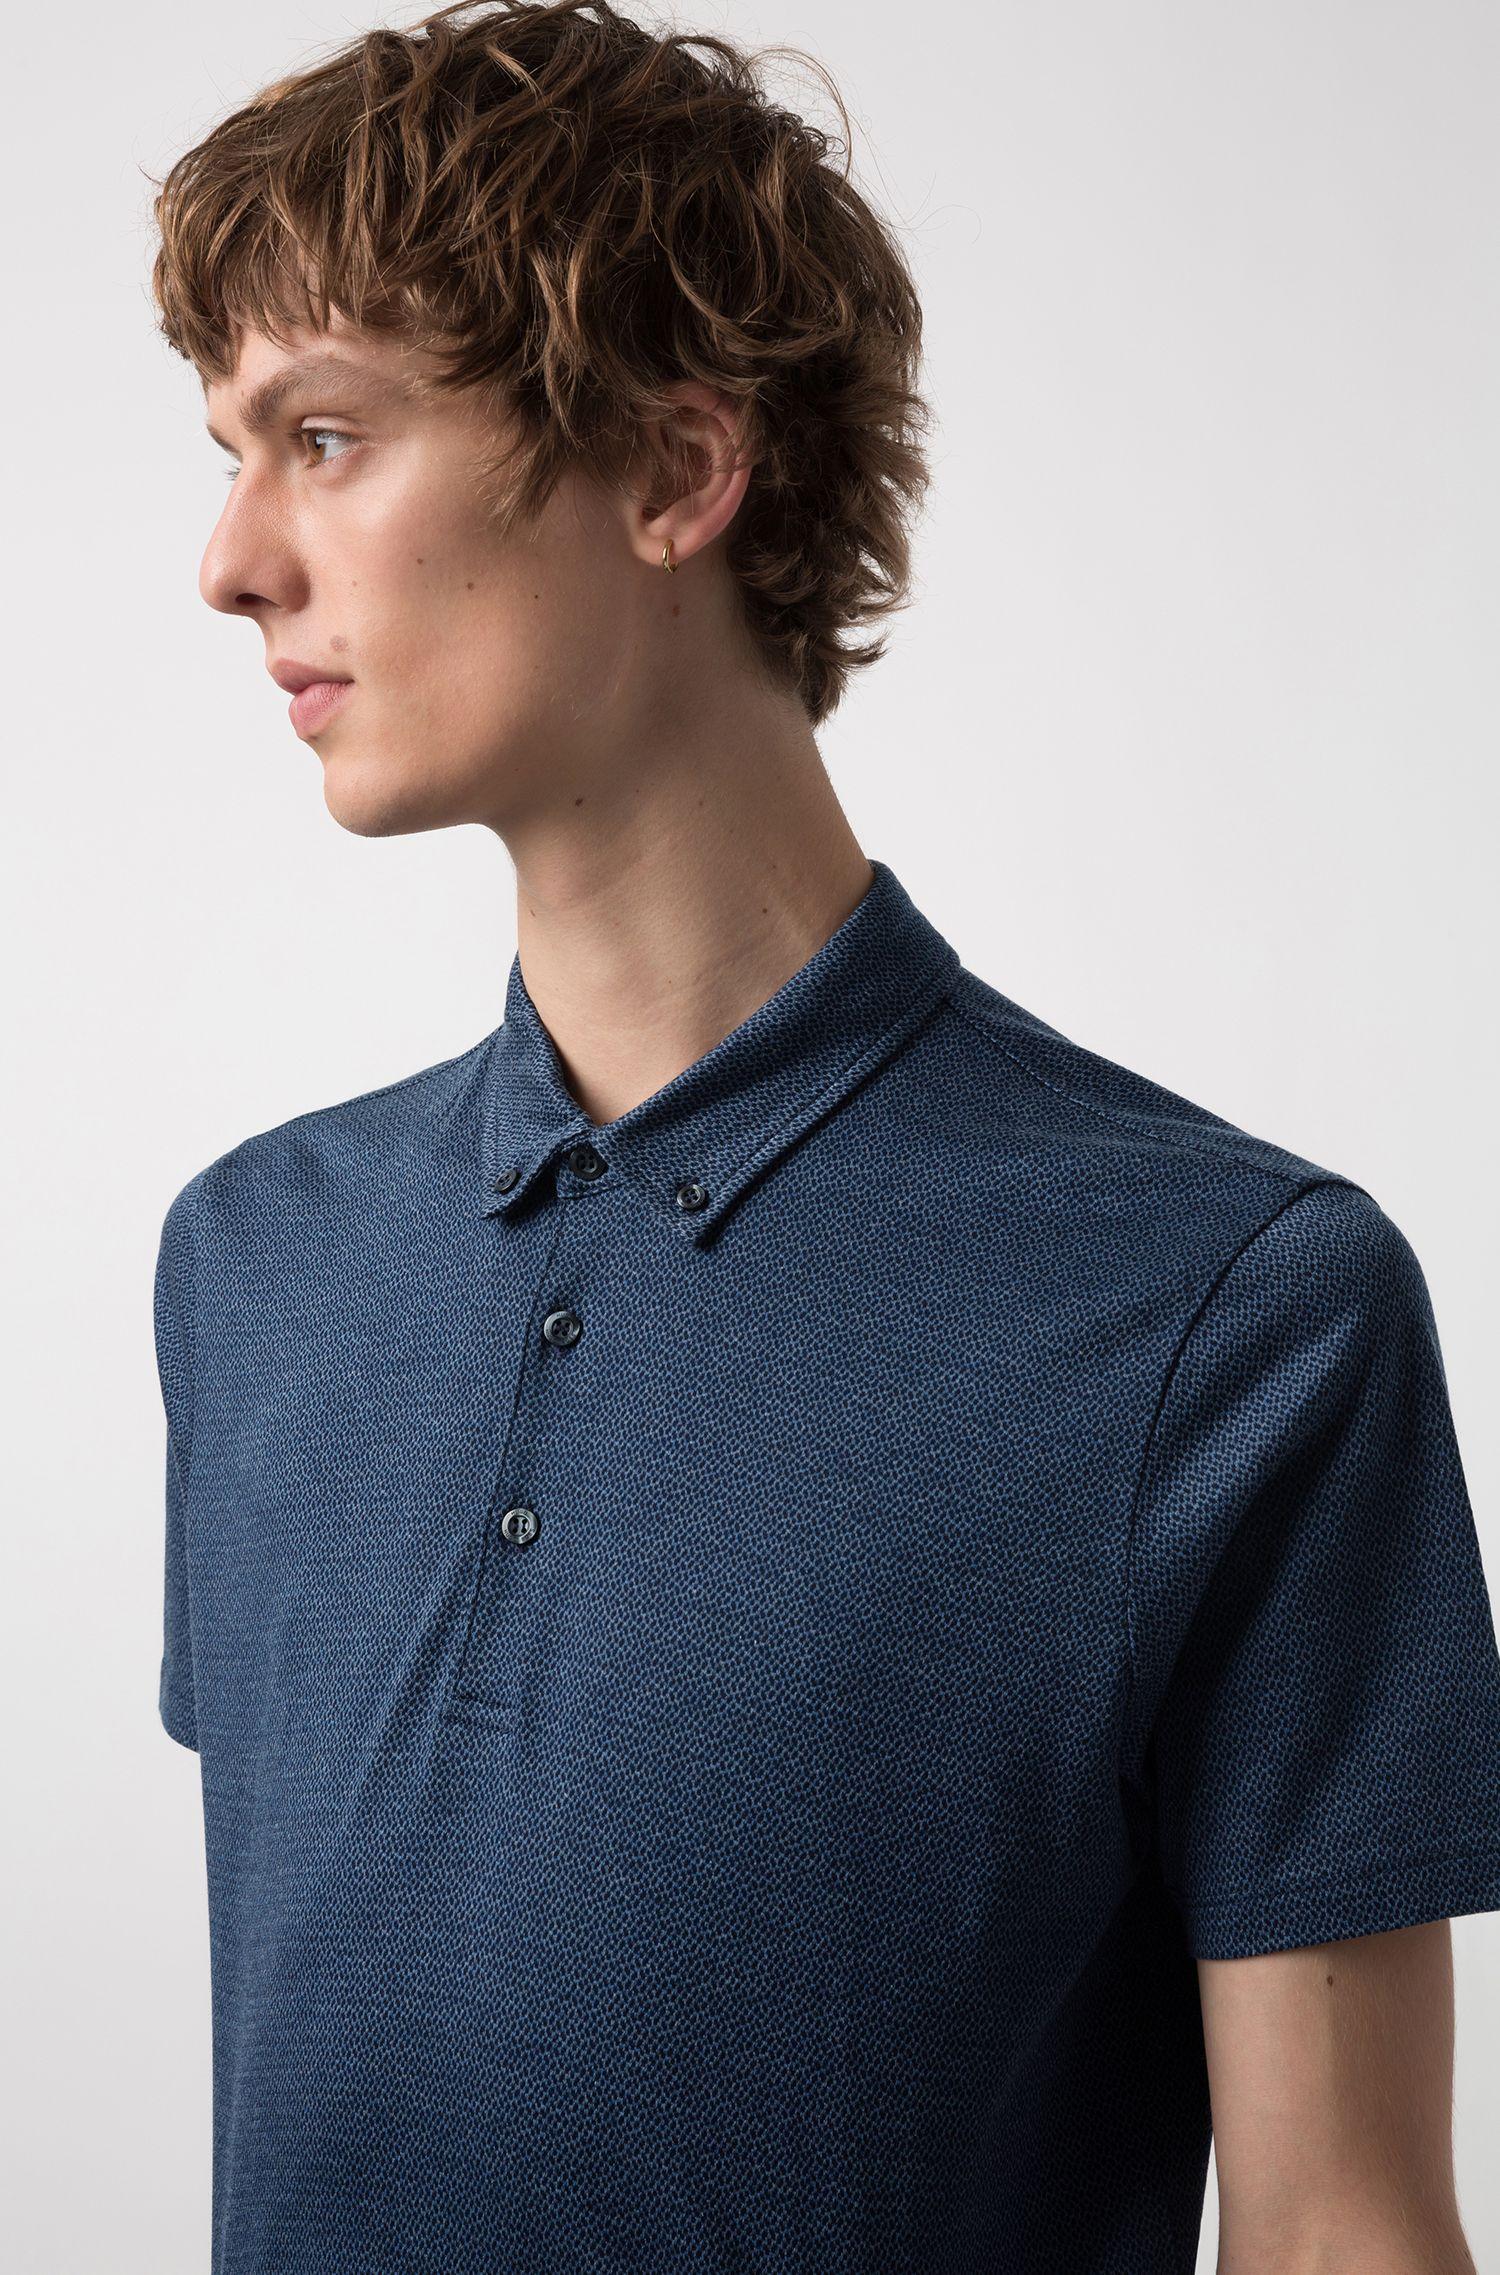 Regular-fit knitted polo shirt in lightweight cotton jacquard, Dark Blue